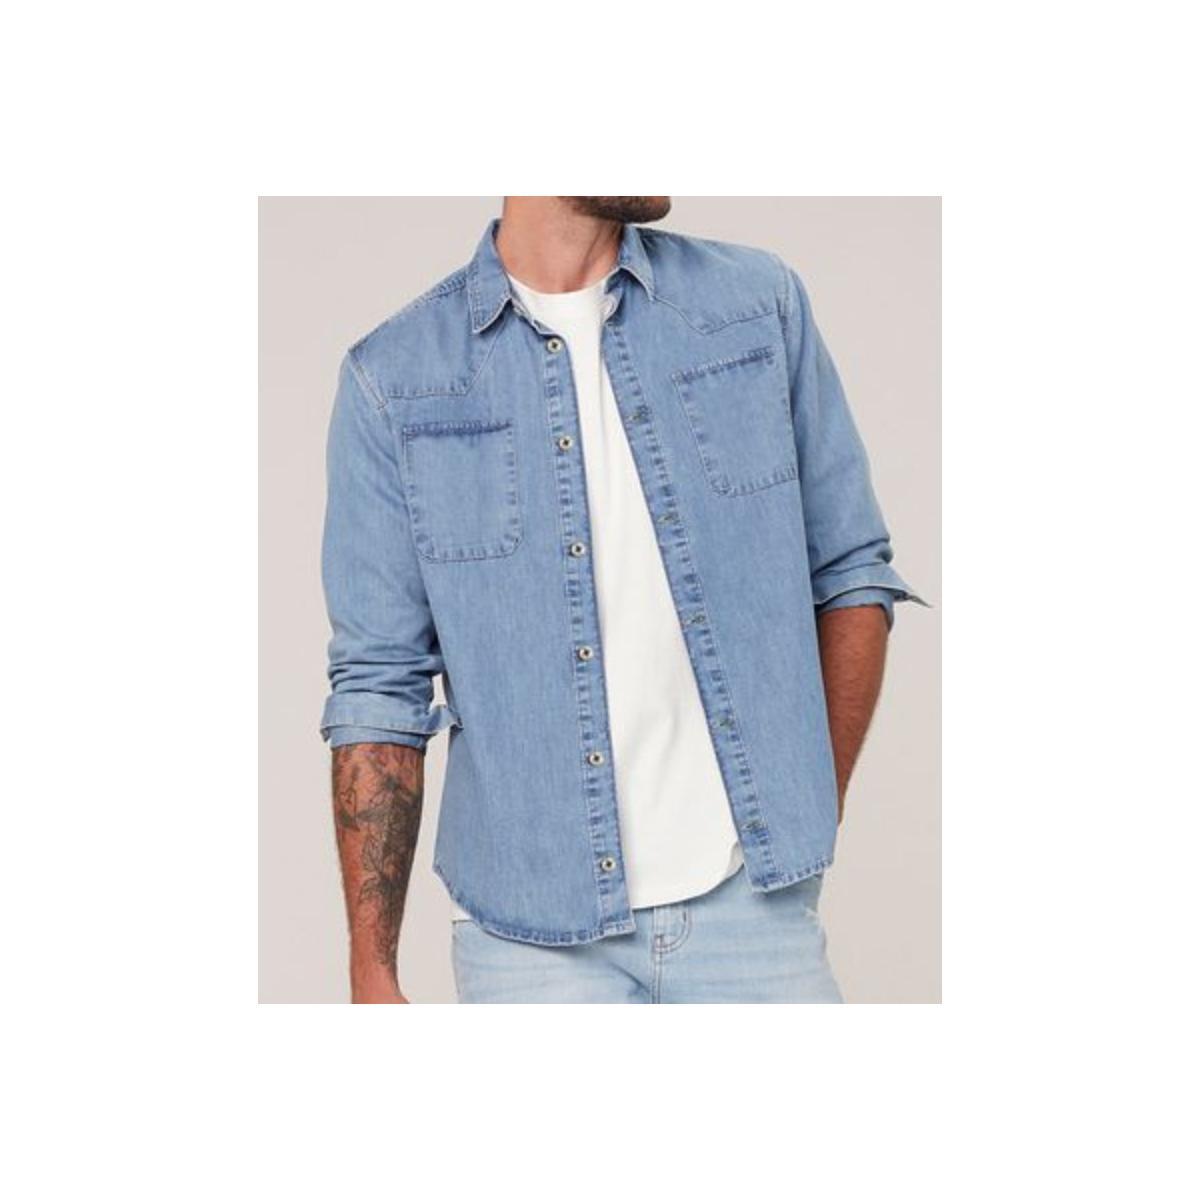 Camisa Masculina Dzarm Zilj 1bsn Jeans Claro